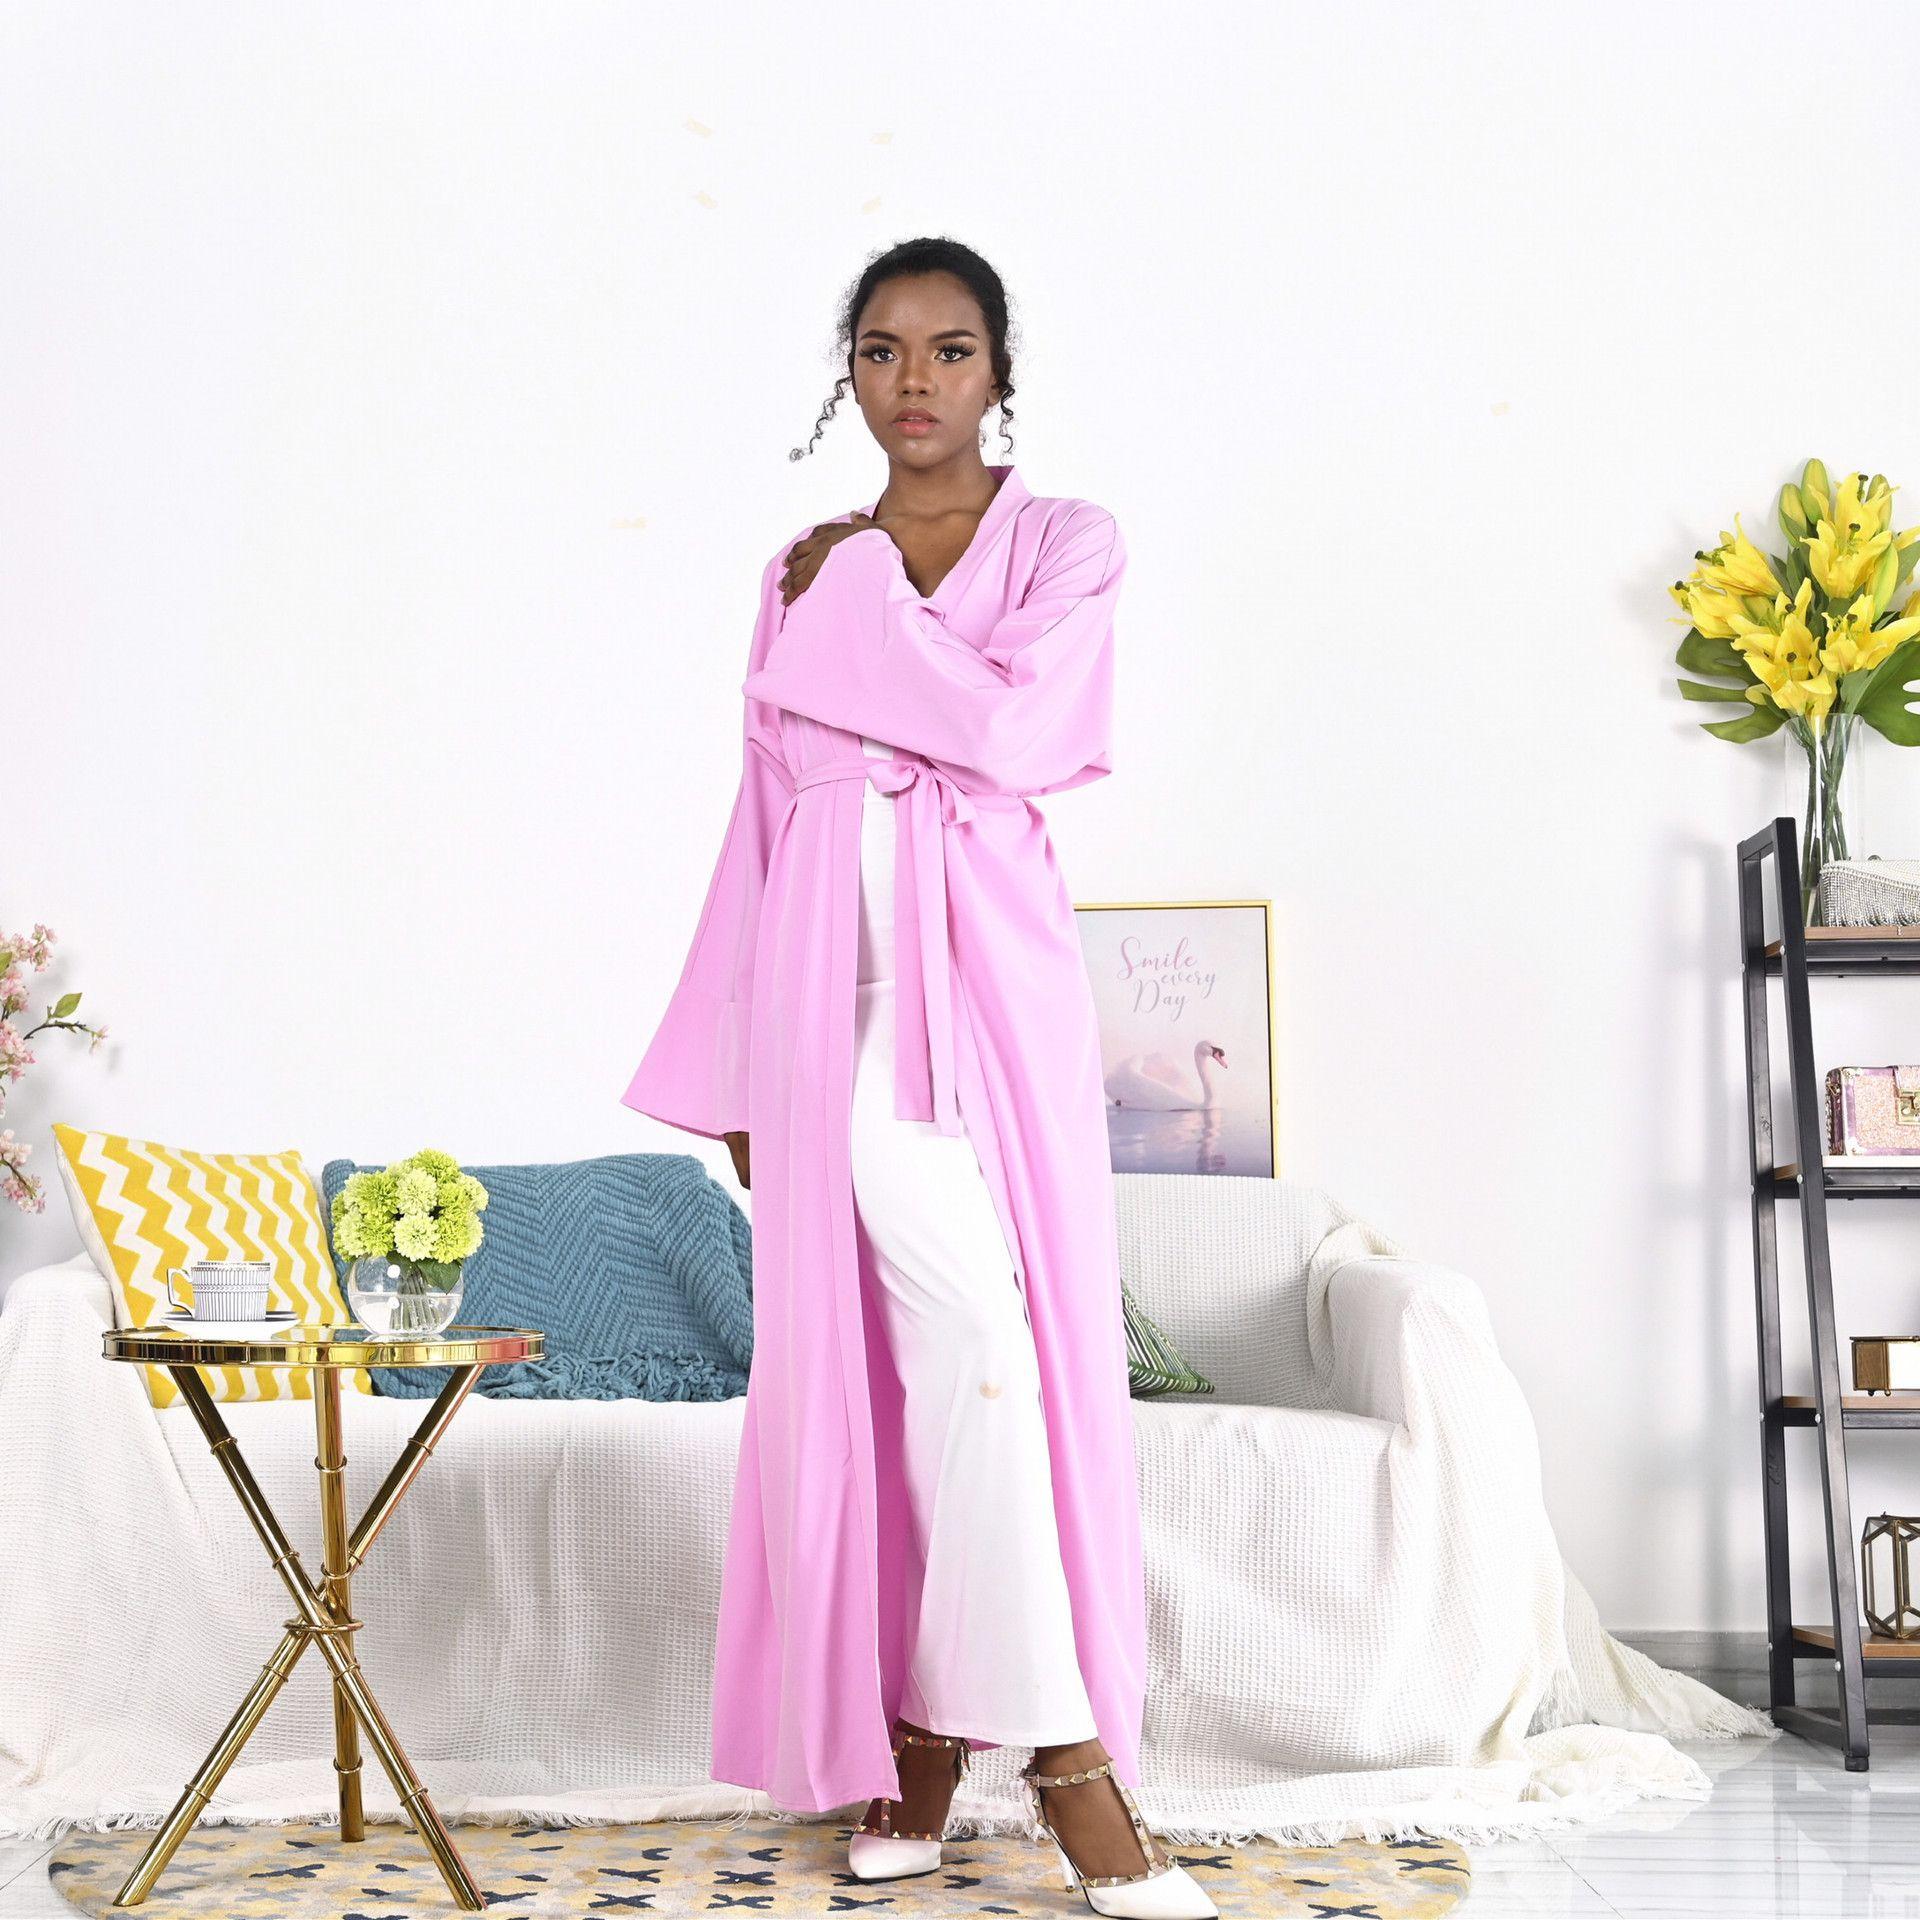 Più recente Opend Cardigan Musulmano Kimono Robe Syari Syari Femminile Dress Silk Dress Seta Abaya Servizio di culto Abayas F1964